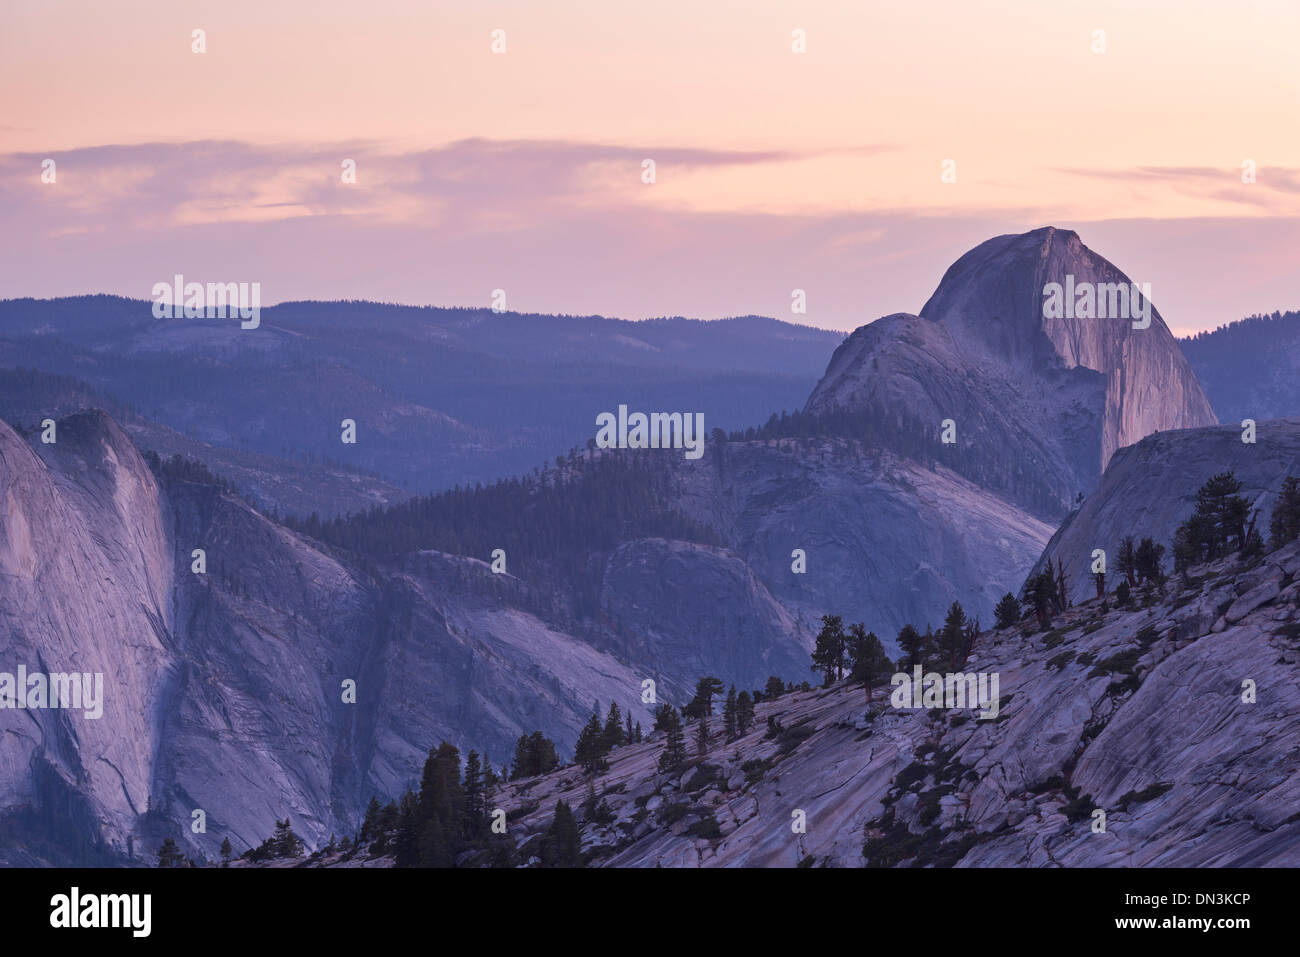 Dämmerung über Half Dome, Yosemite-Nationalpark, Kalifornien, USA. Herbst (Oktober) 2013. Stockbild